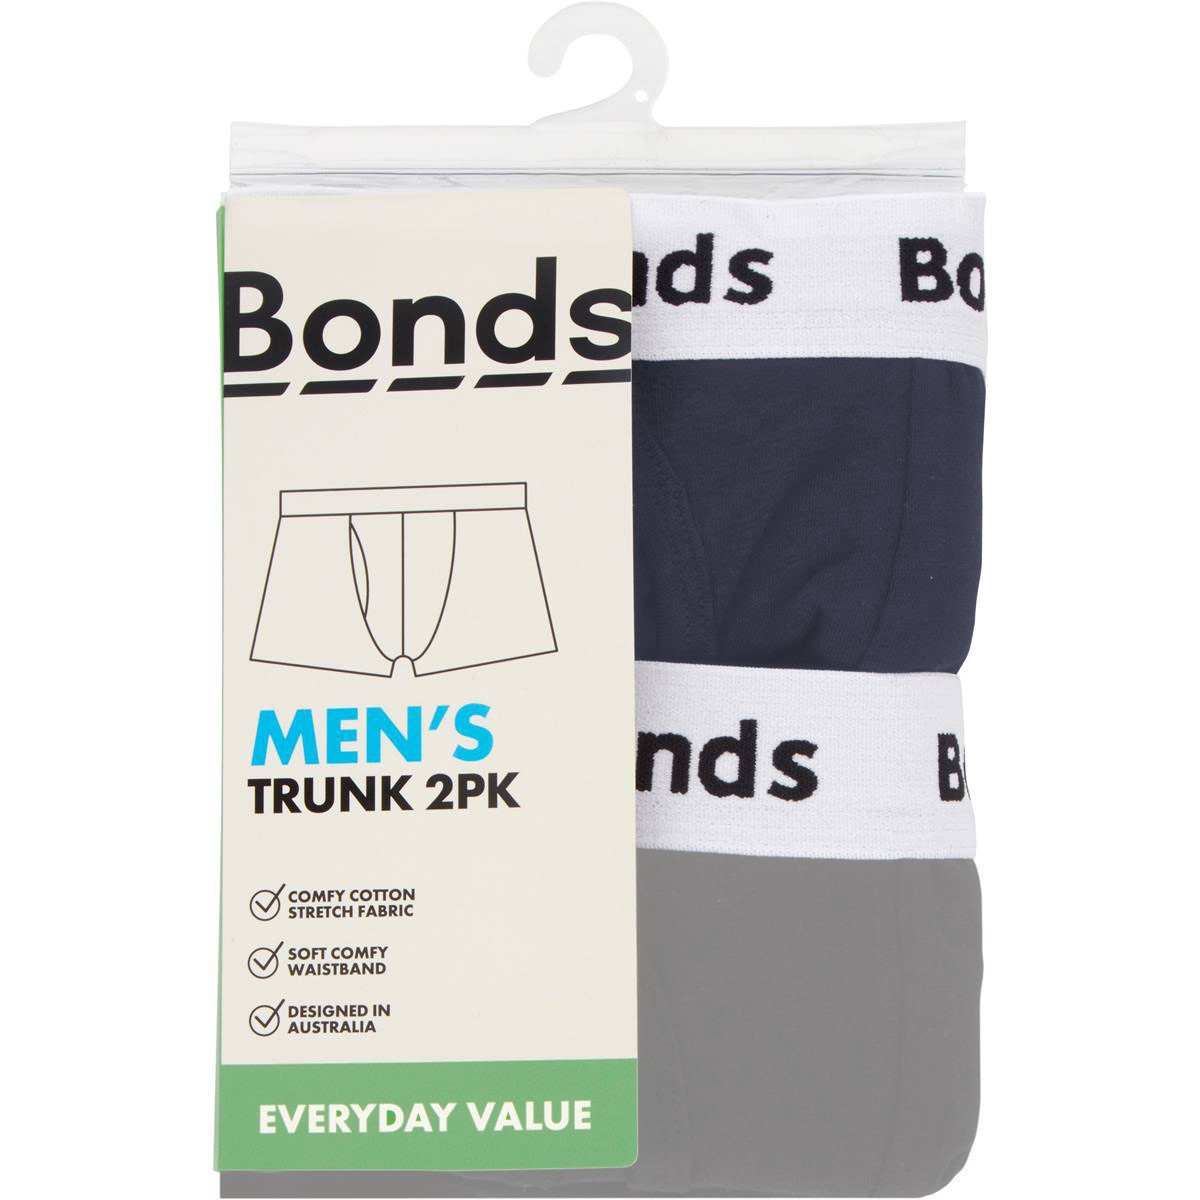 thumbnail 29 - 3 / 4 / 6 / 10 Pairs Bonds Mens Trunks Briefs Boxers Underwear Clearance $149.7